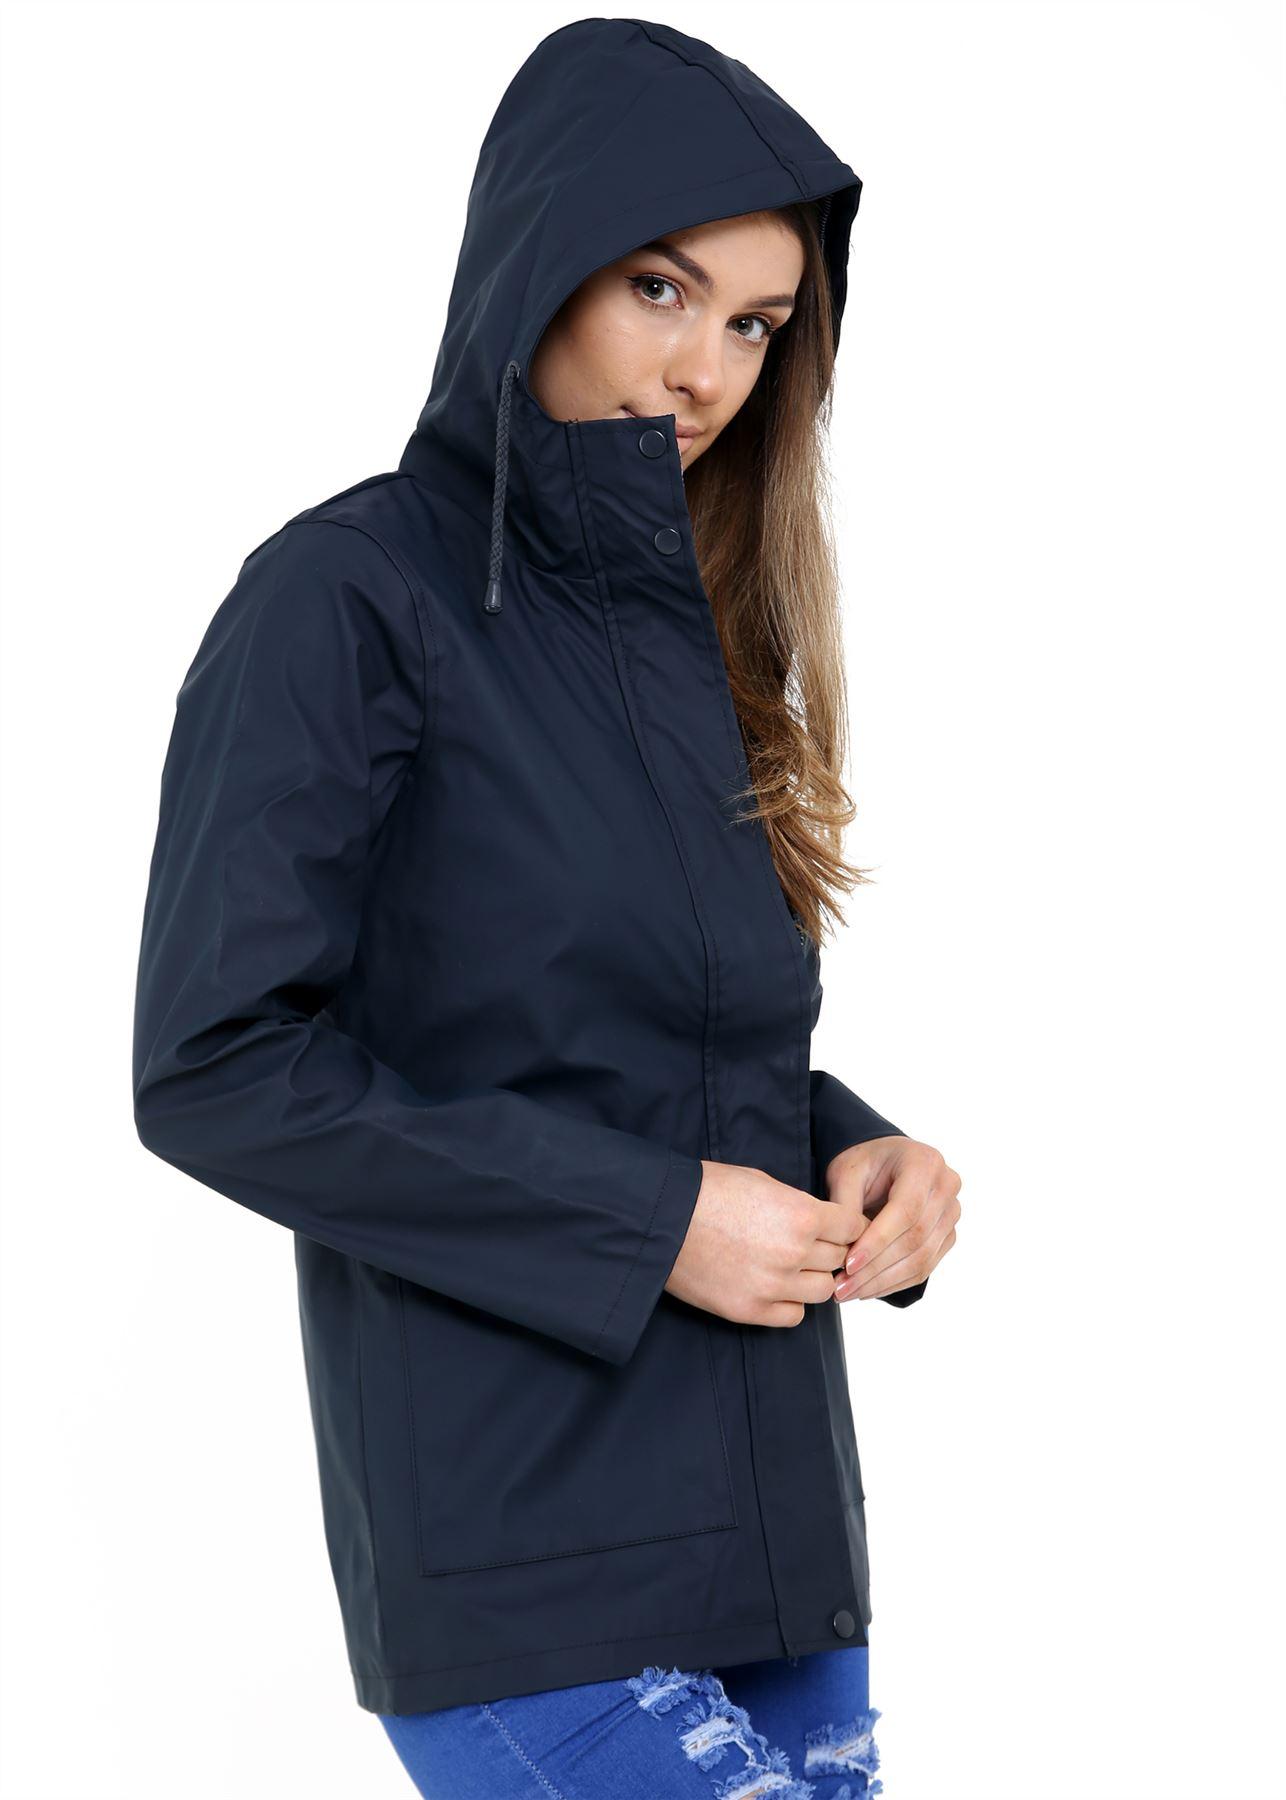 New-Womens-Lightweight-Rain-Trench-Coat-Jacket-Parka-Daily-Rain-Mac thumbnail 3